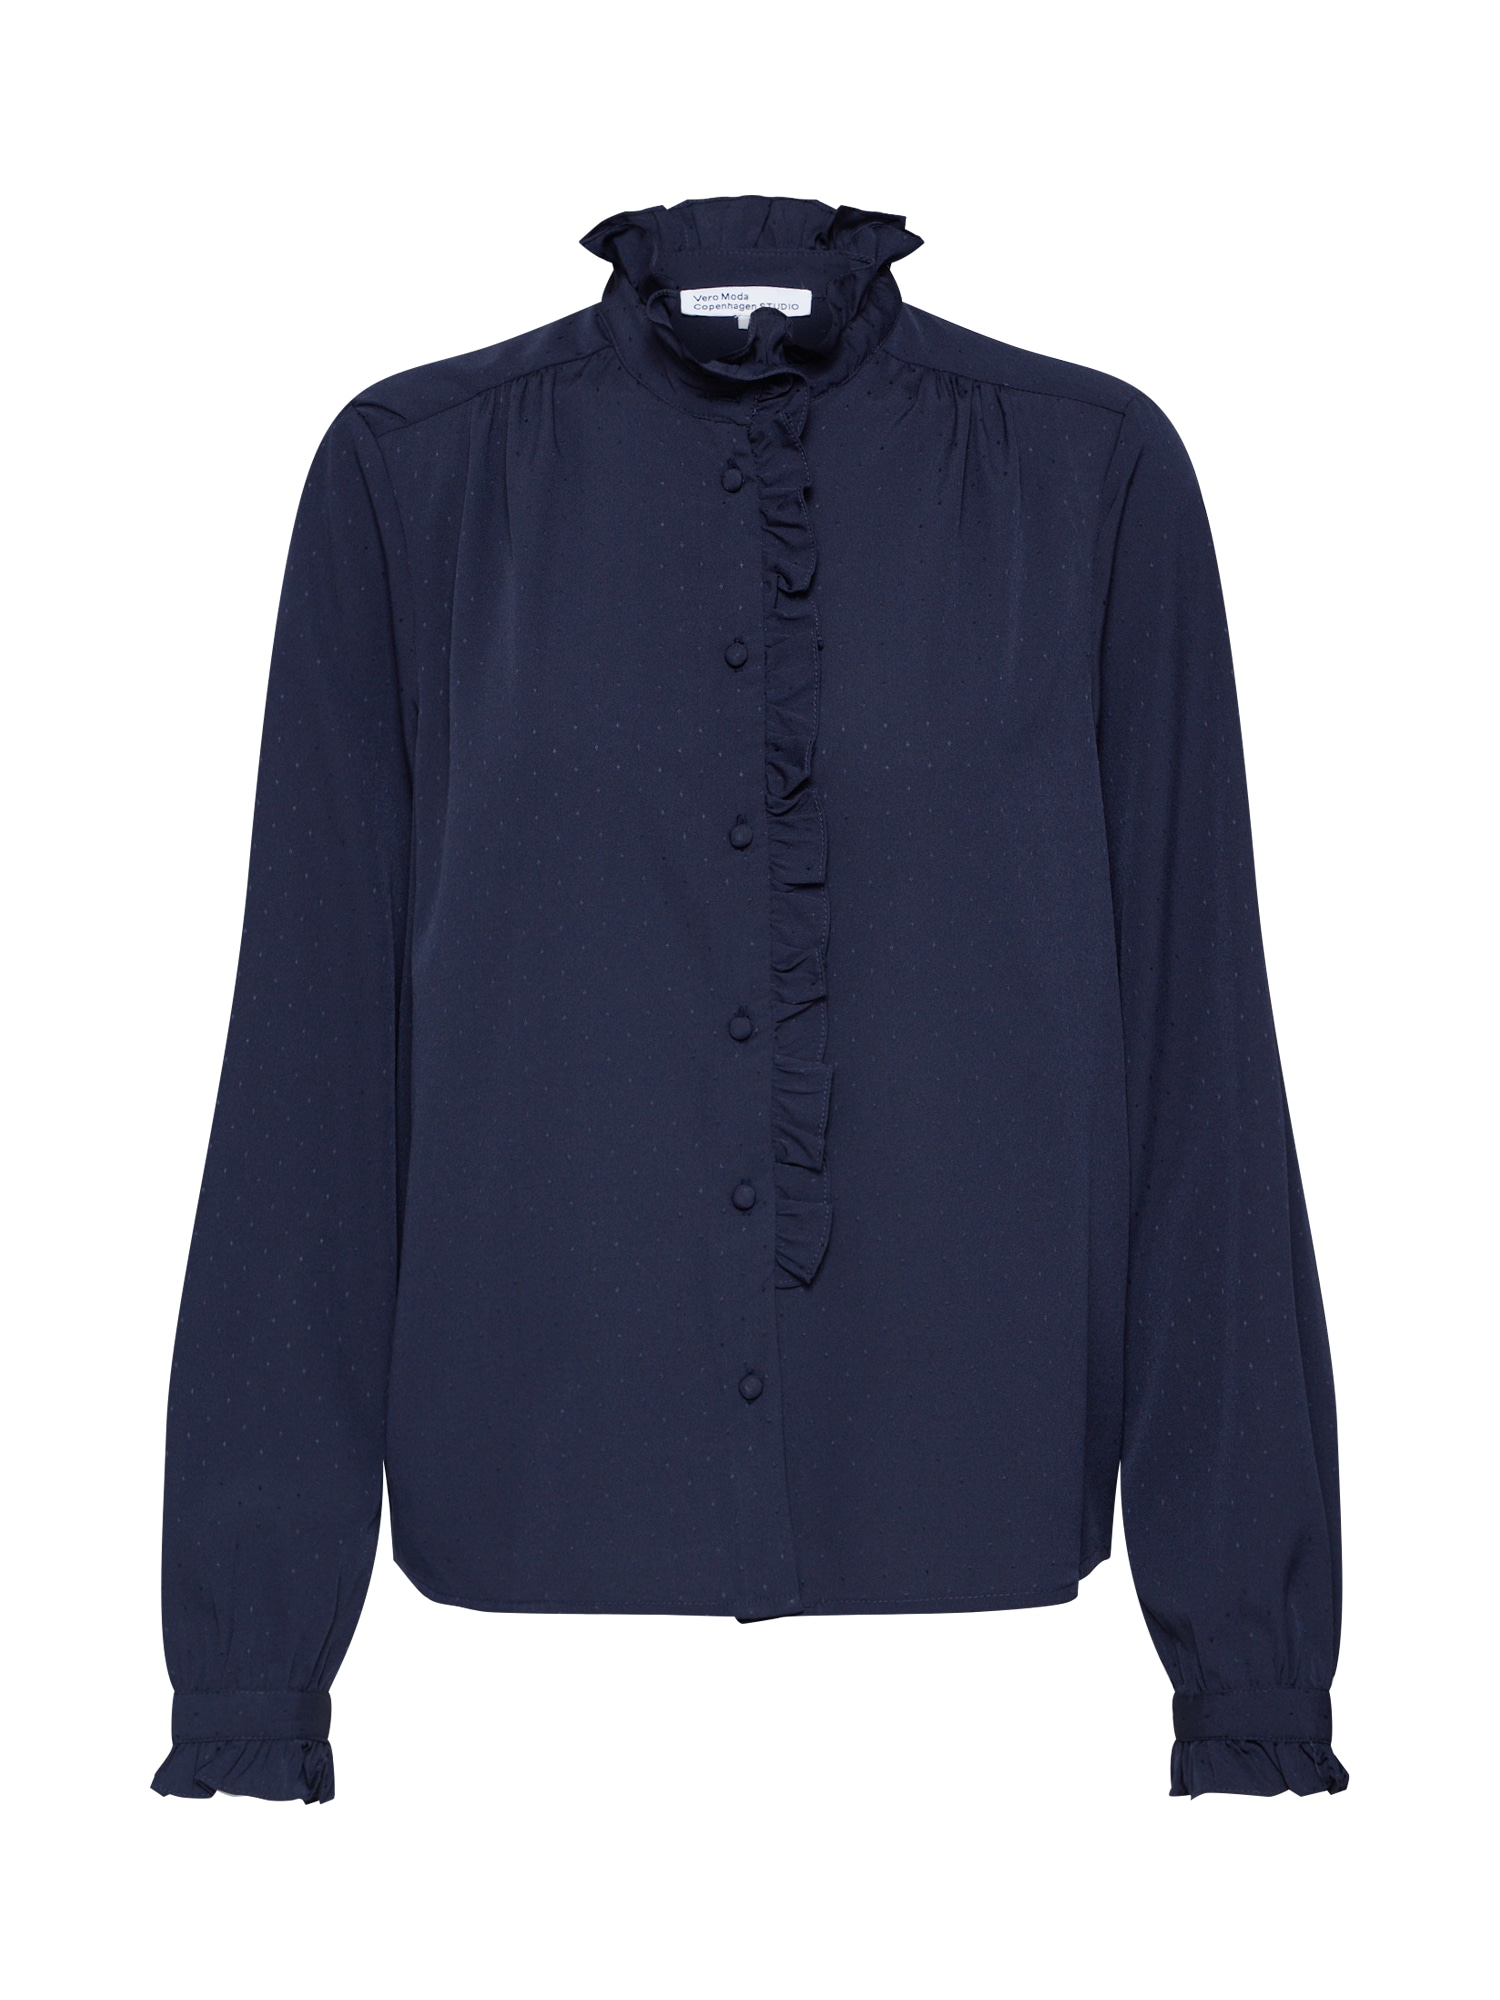 Vero Moda Copenhagen STUDIO Halenka 'LENA'  noční modrá